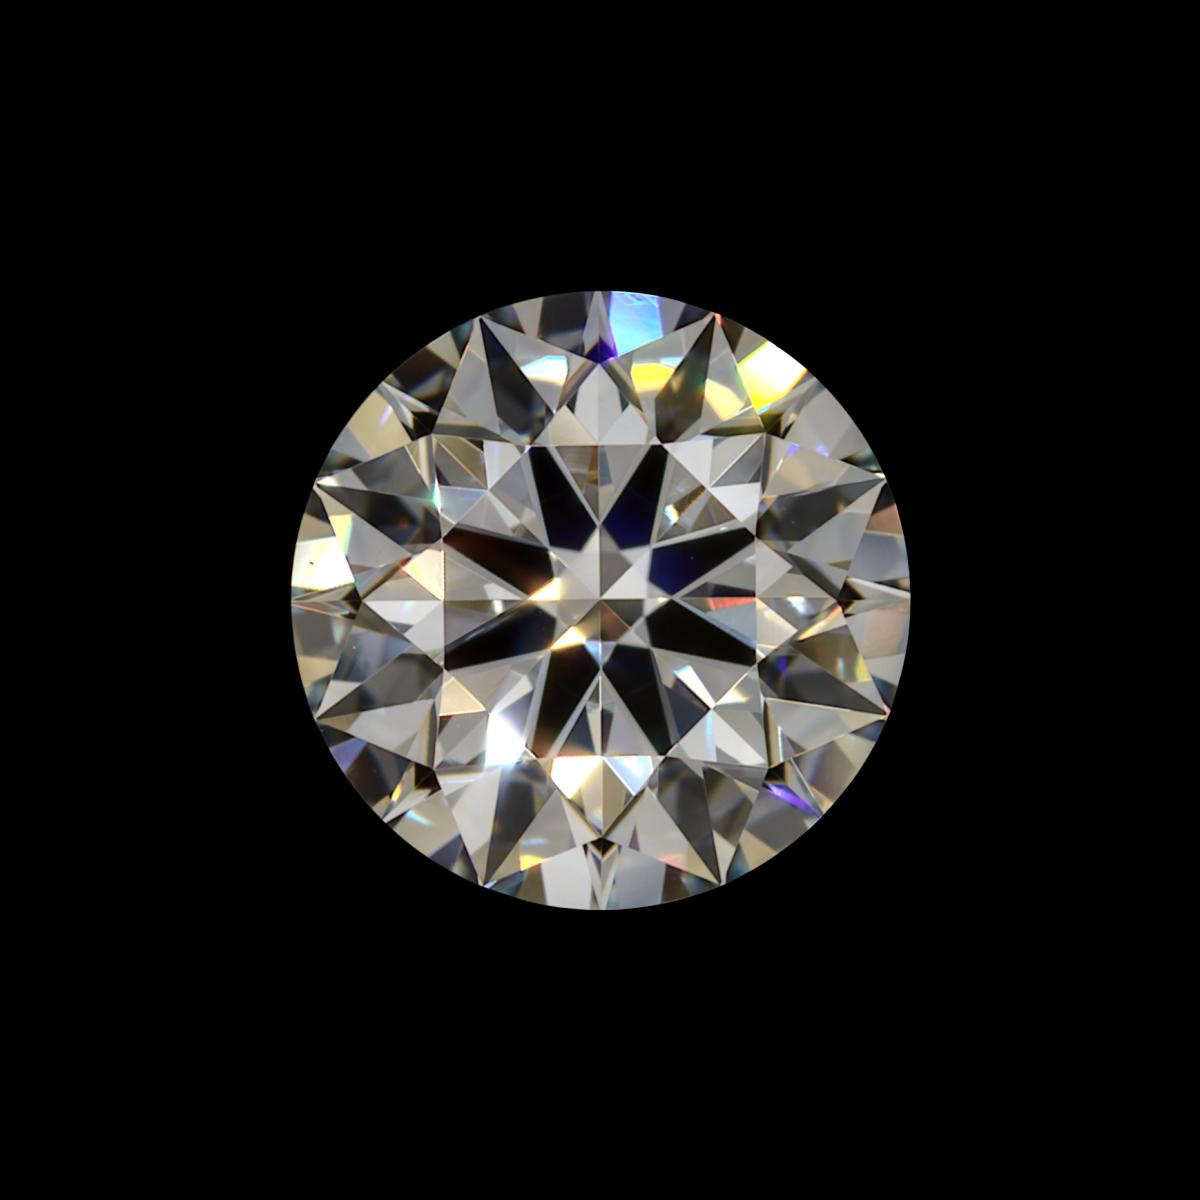 https://cdn.briangavindiamonds.com/files/mp4/CAGS-104106086123/CAGS-104106086123-Fire-02.mp4